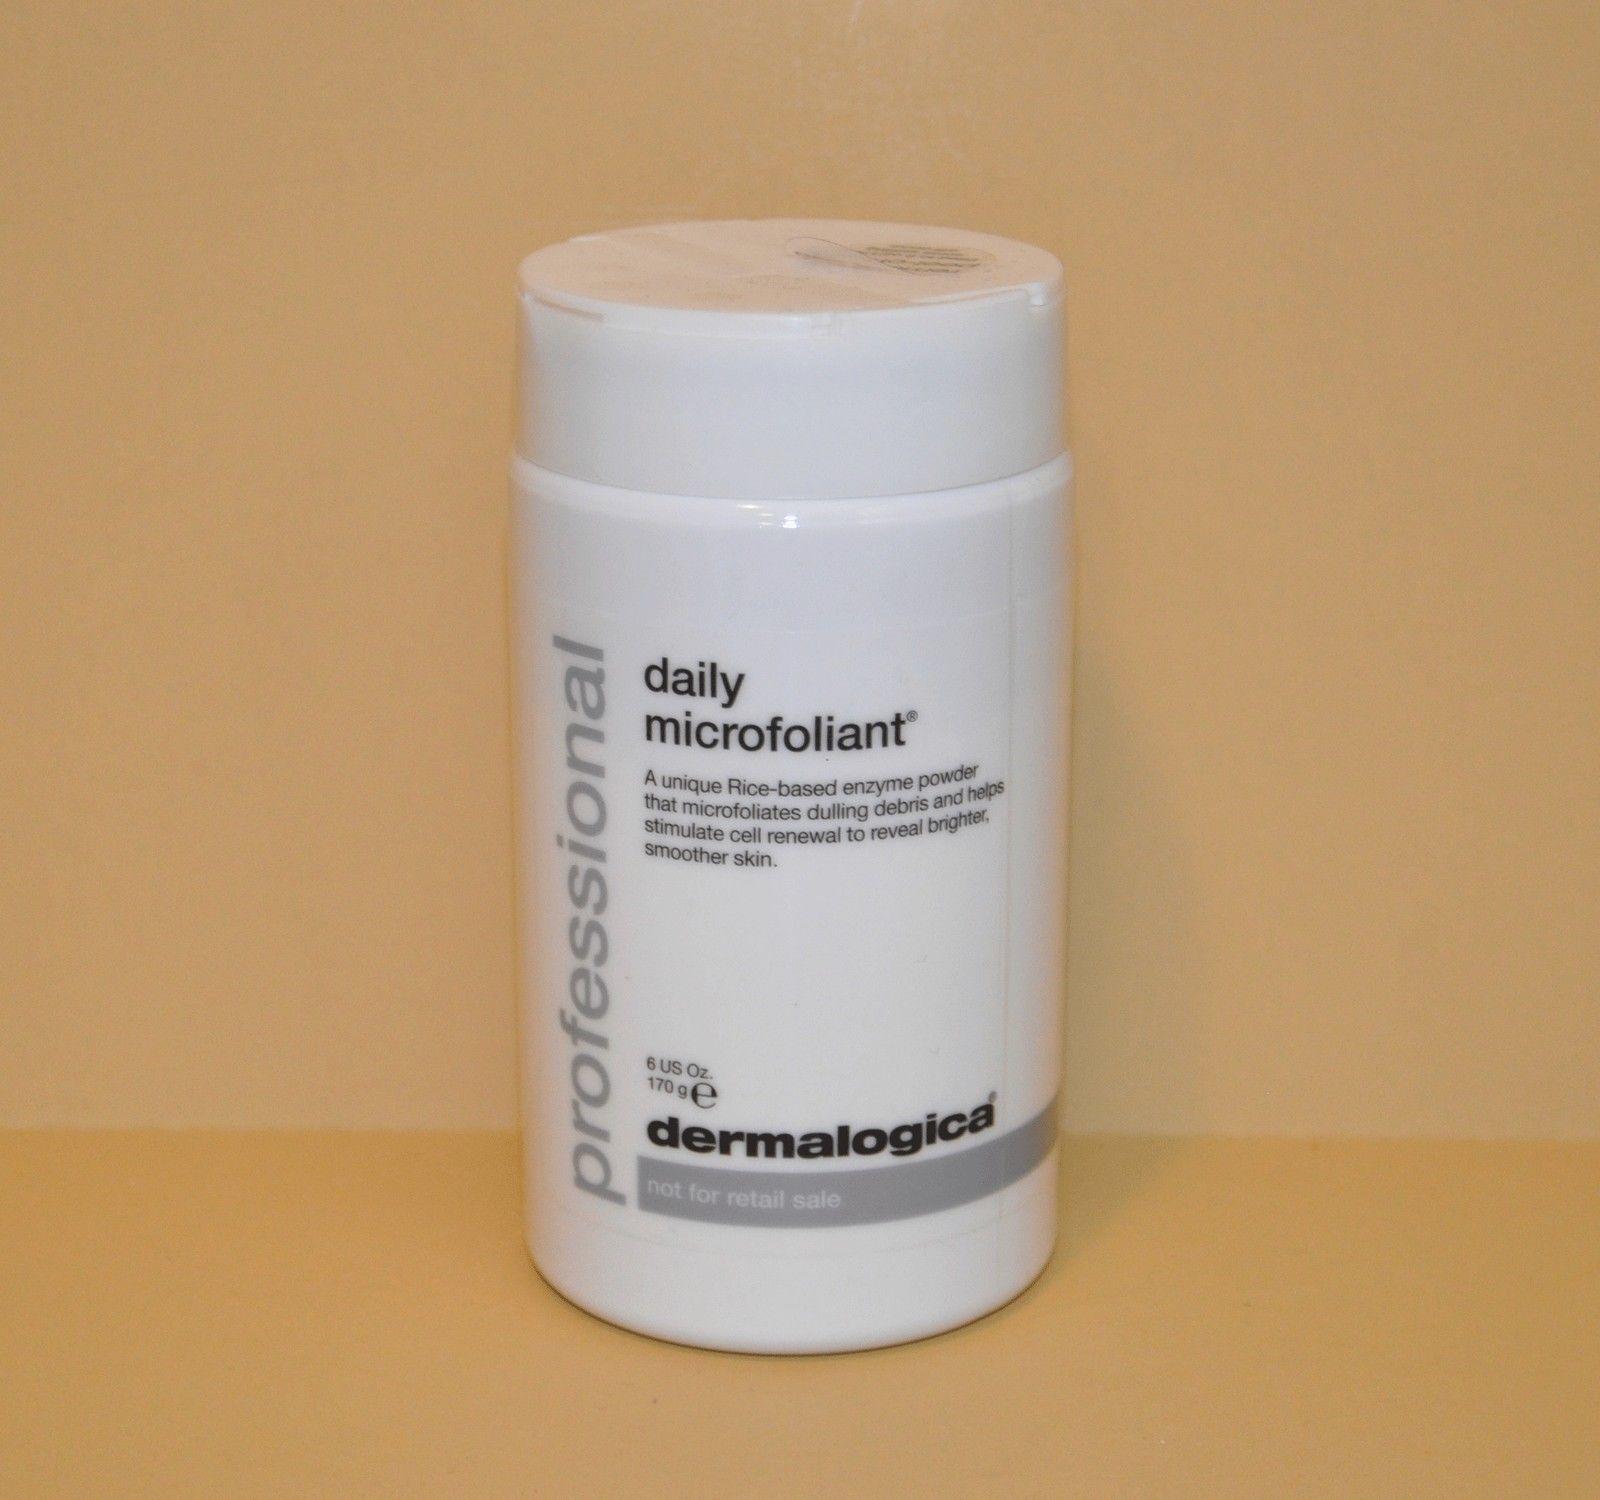 Dermalogica Daily Microfoliant 170g/6oz. Professional Size - $89.95